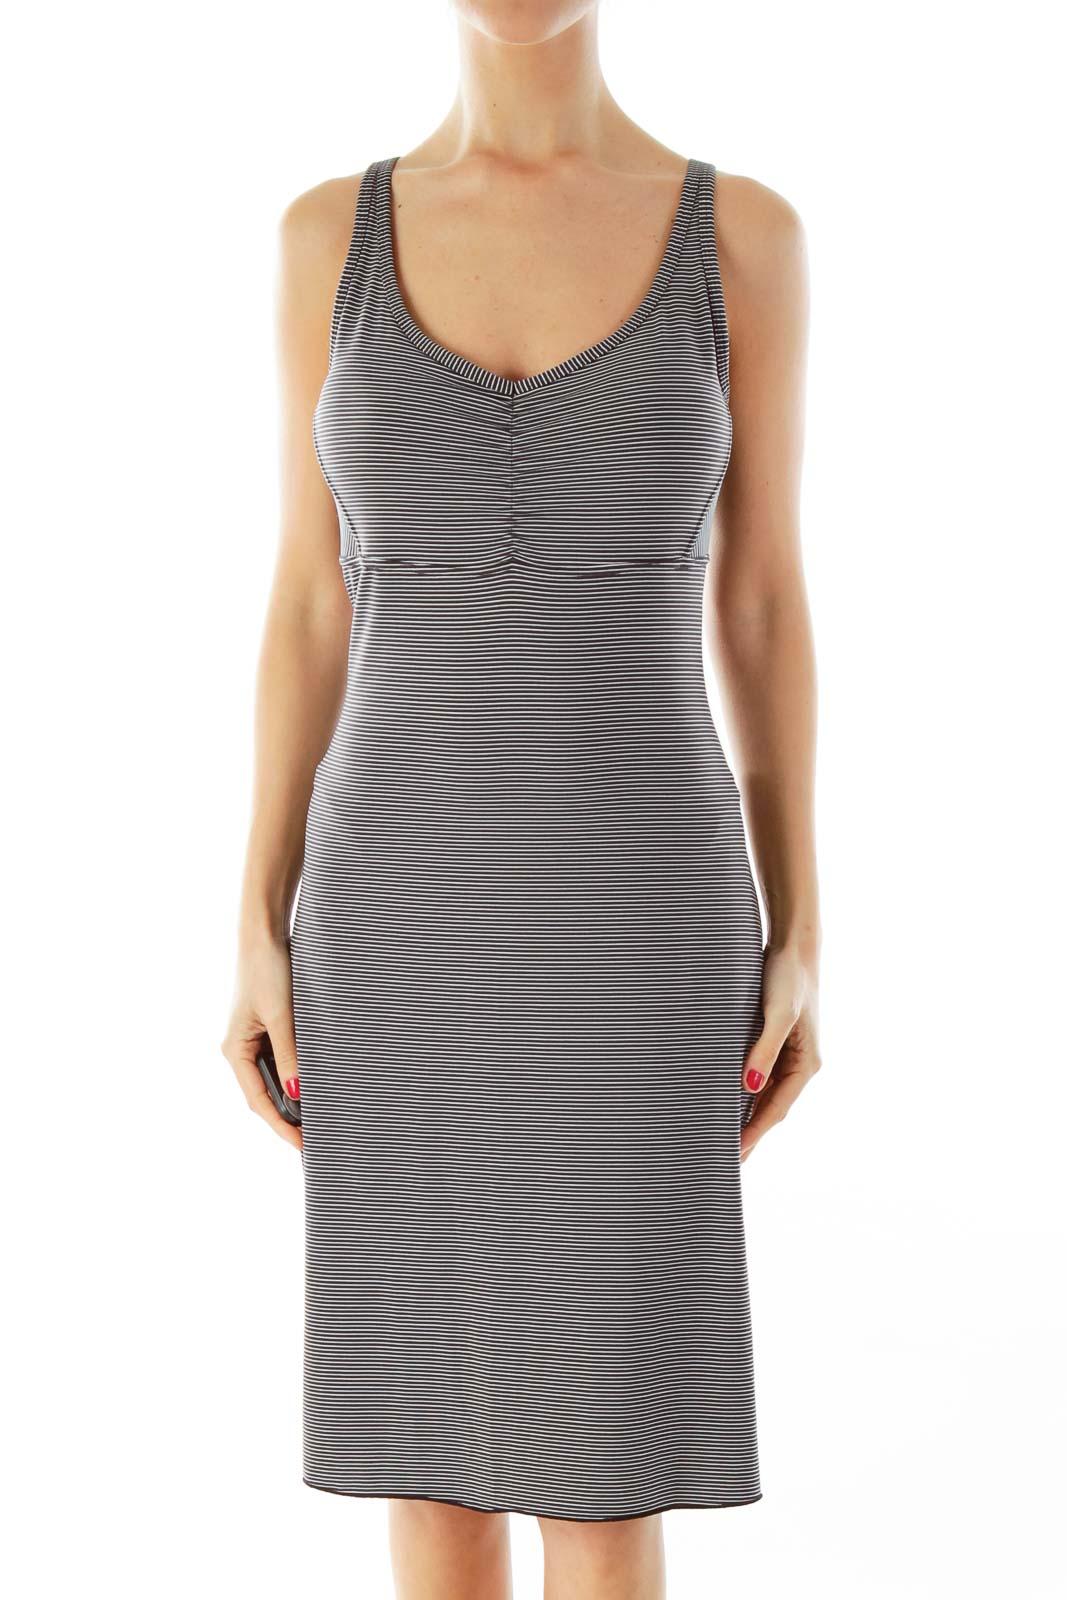 Black & White Pinstripe Athletic Dress